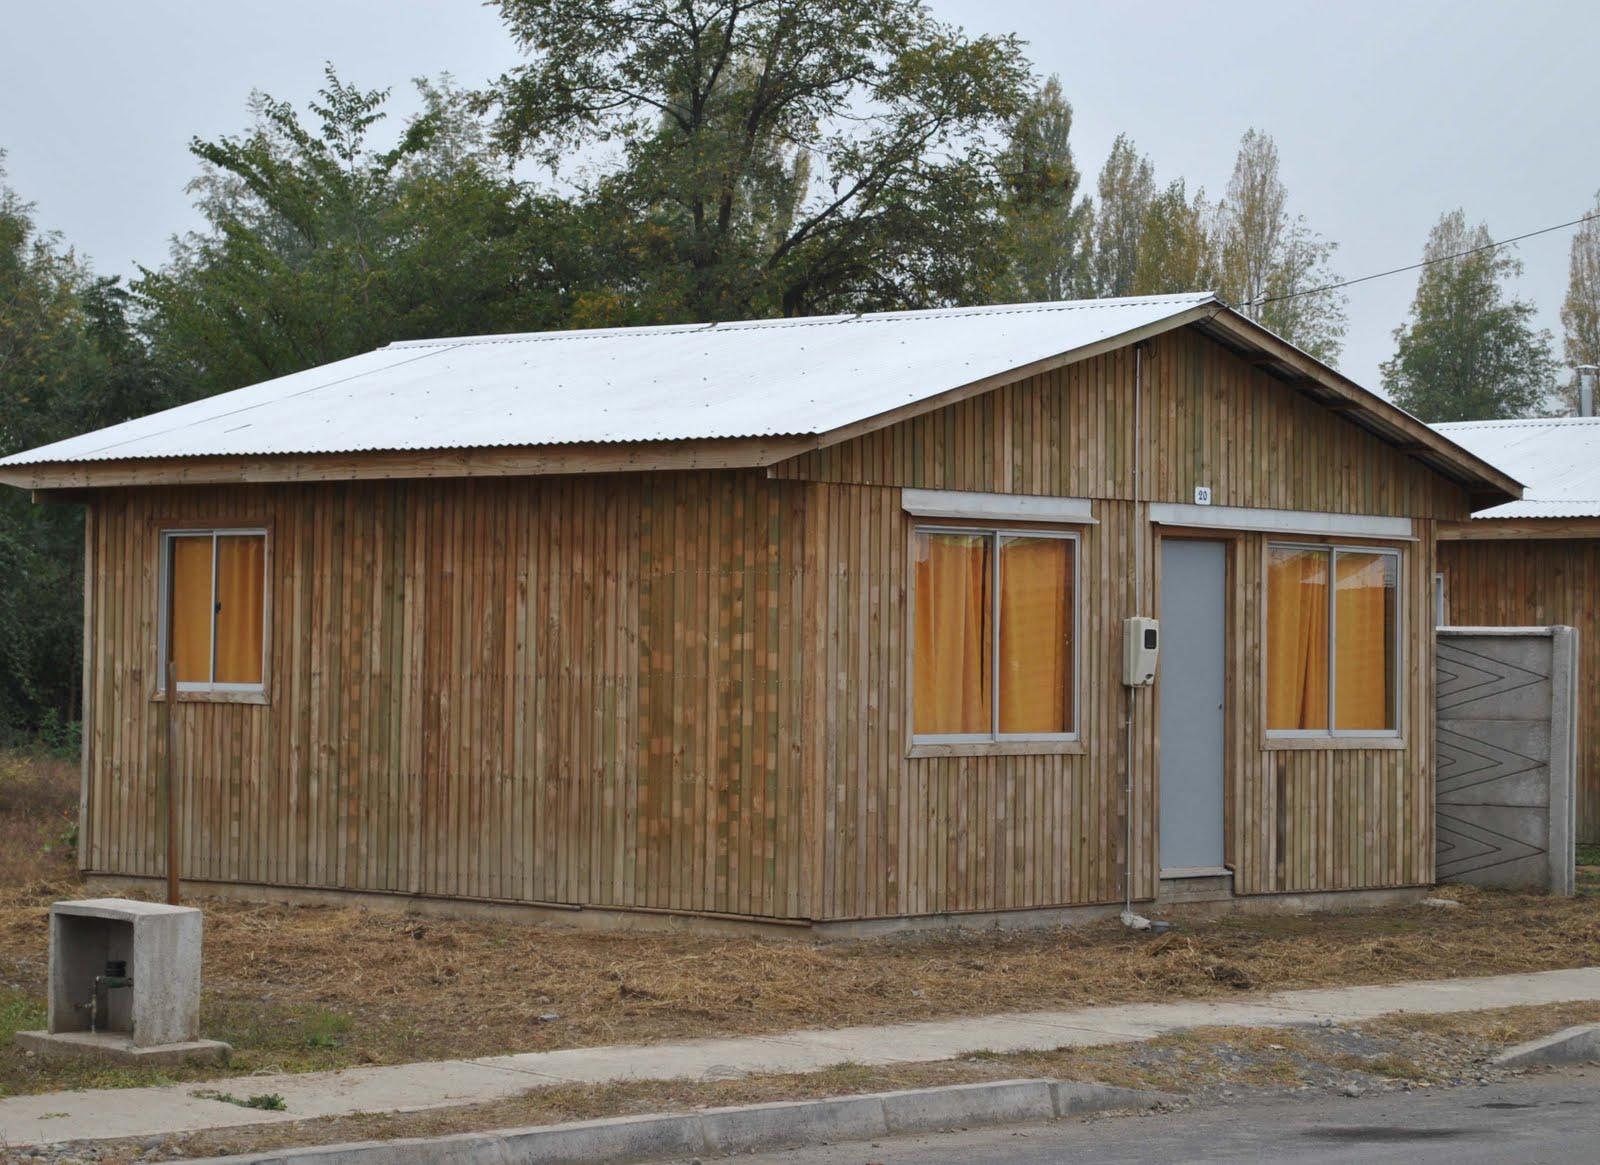 Diferentes tipos de viviendas imagui for Tipos de cielorrasos para casas